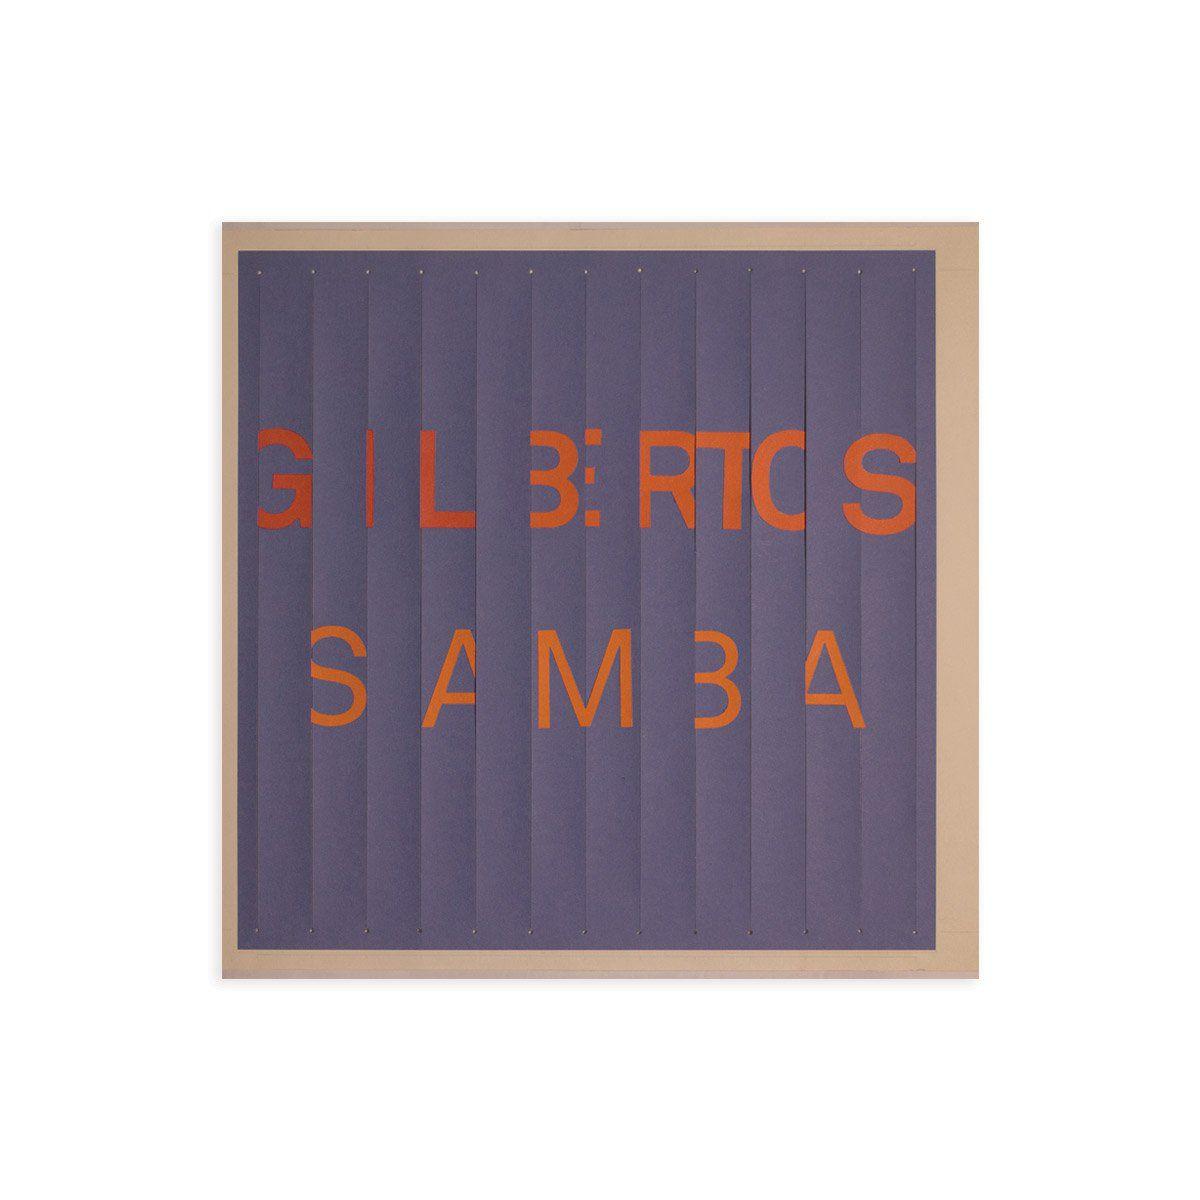 LP Gilberto Gil Gilbertos Samba  - bandUP Store Marketplace